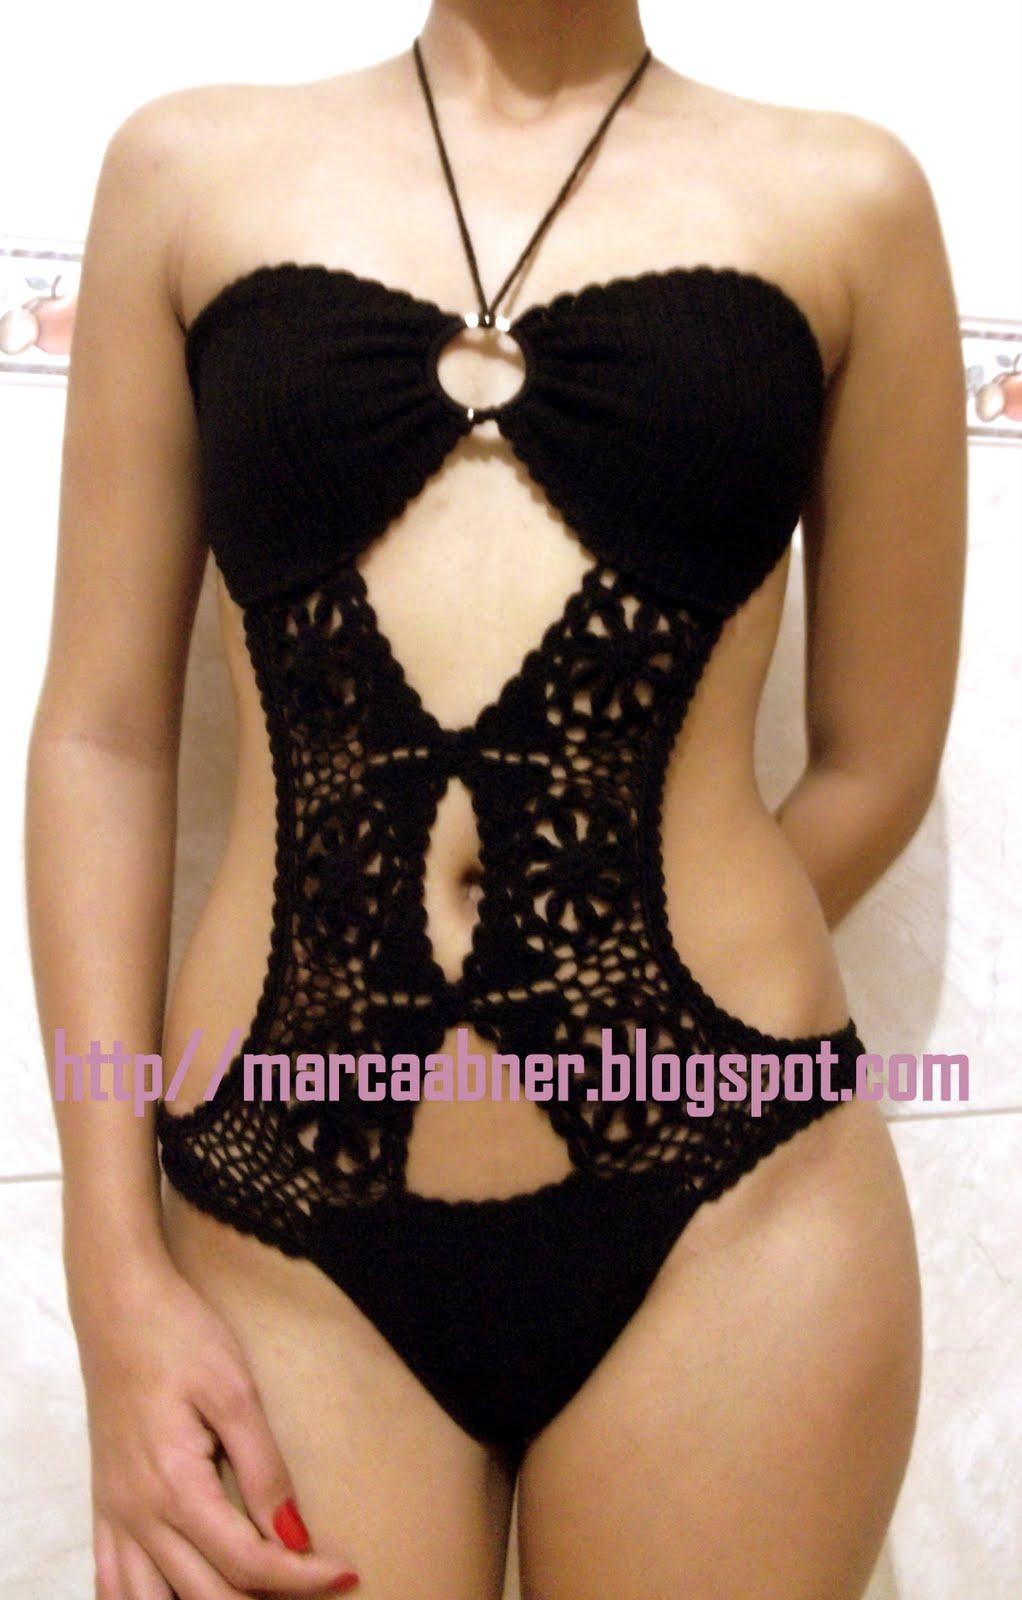 http://2.bp.blogspot.com/-KwBswDxYRdw/Tir28Ab1IGI/AAAAAAAABvQ/VG4O5u-YkHs/s1600/DSCF1361.JPG